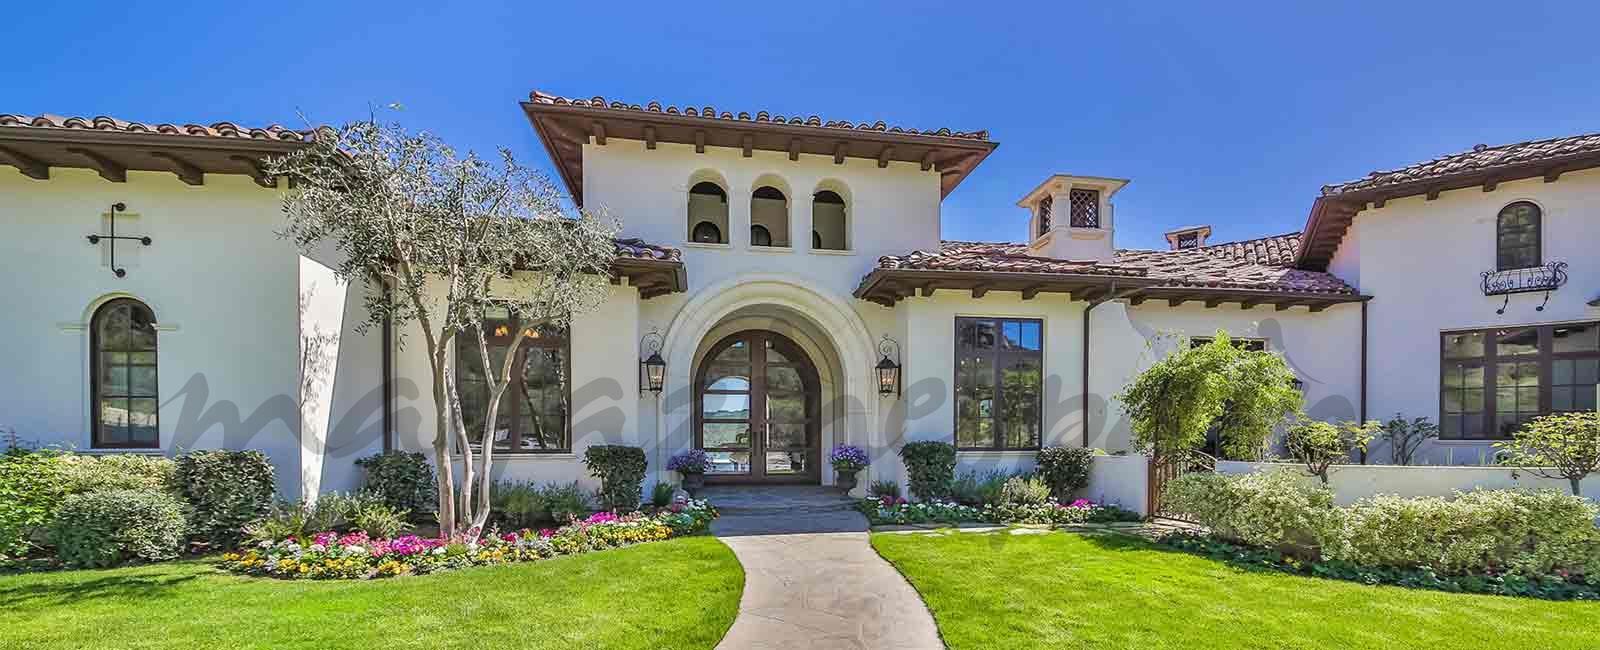 Casa Britney Spears